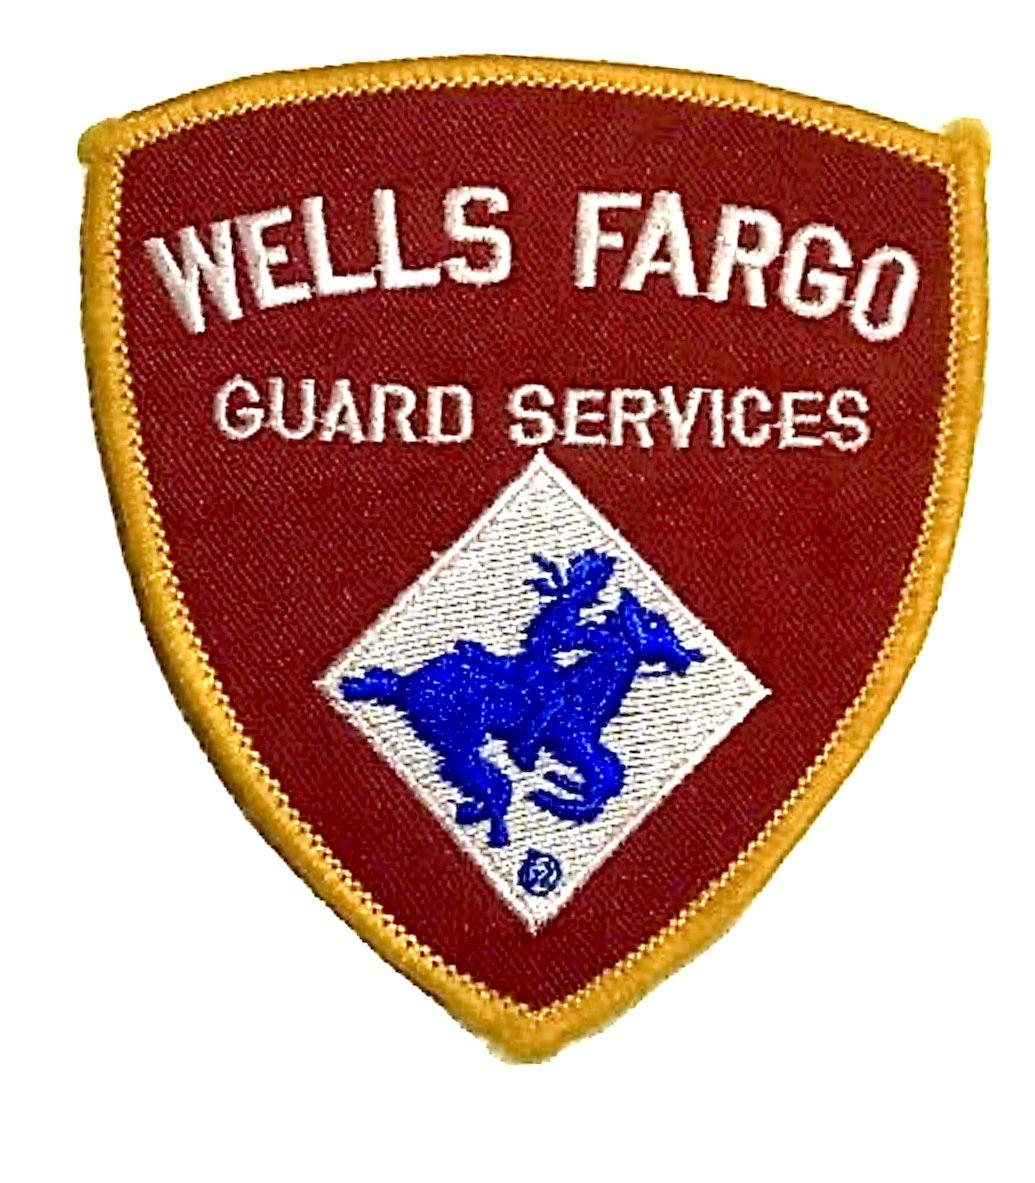 Wells Fargo Guard Services patch in 2020 Wells fargo